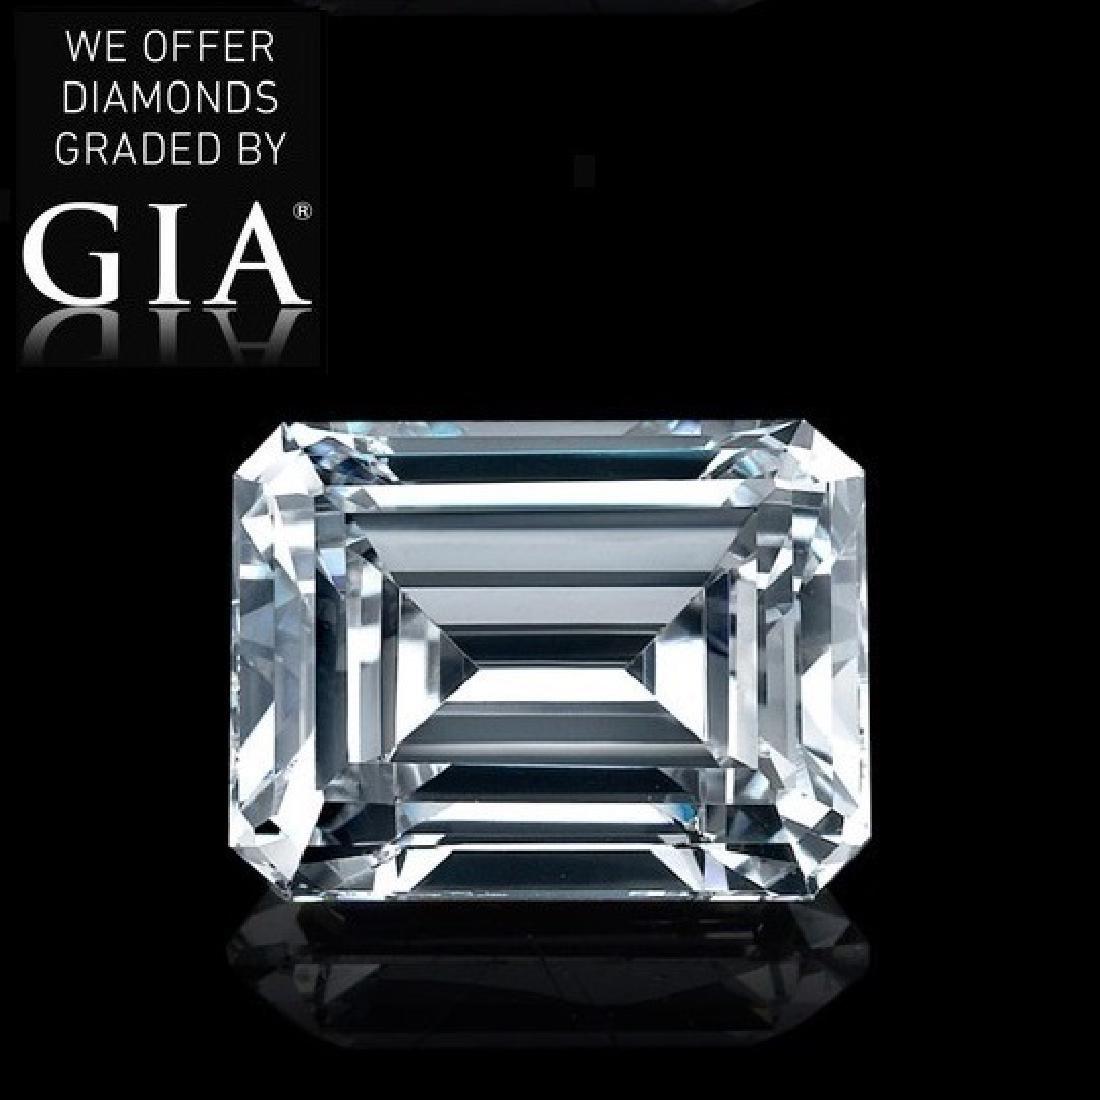 1.01 ct, Color D/VS2, Emerald cut Diamond